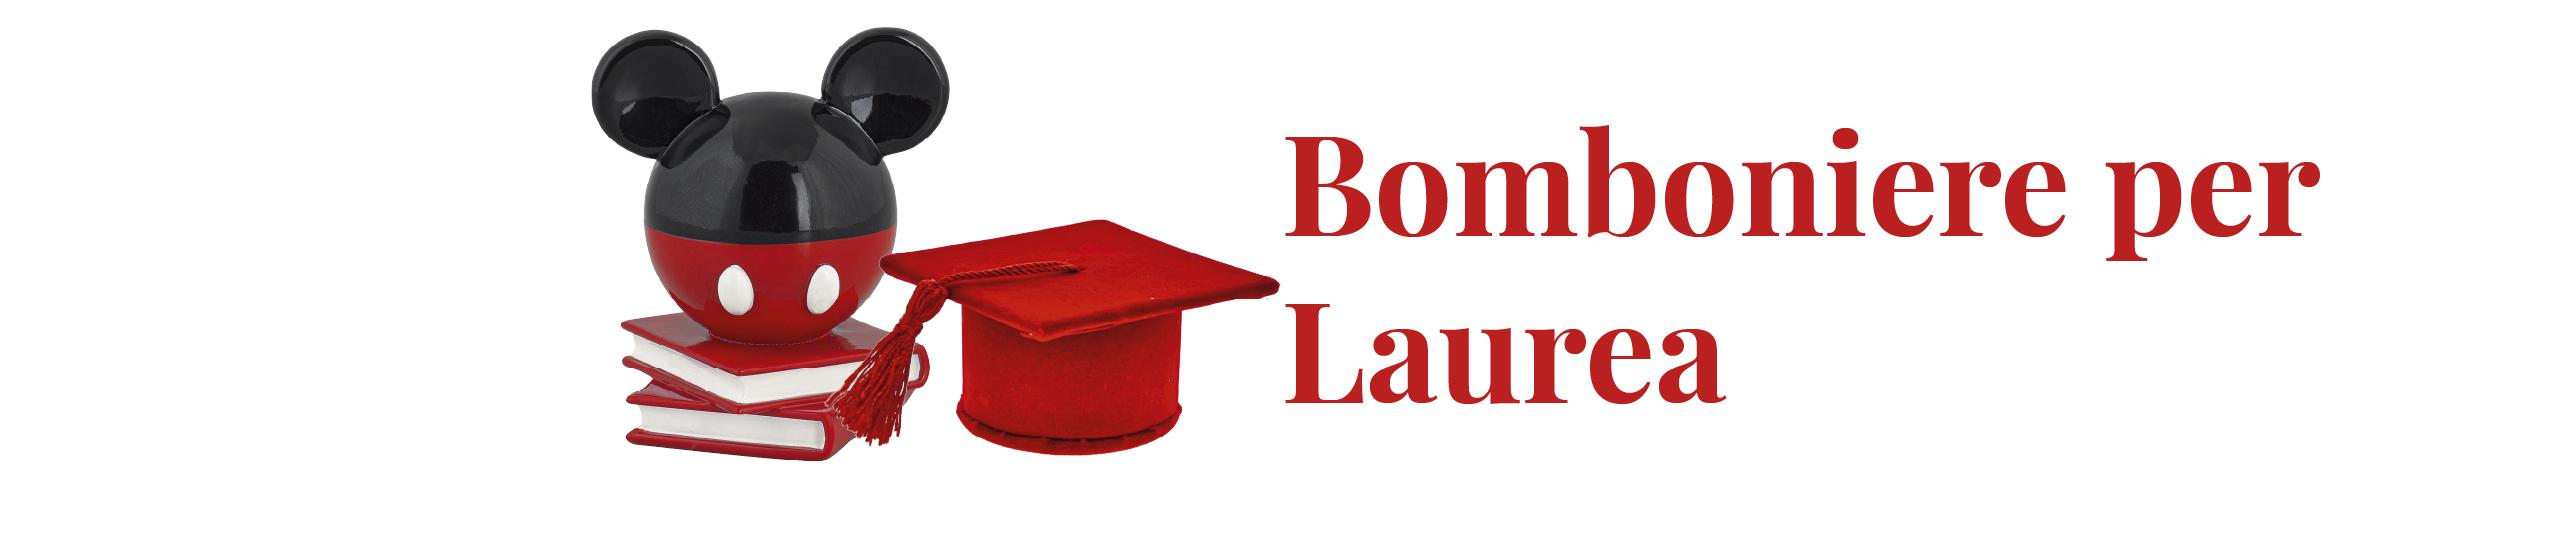 Bomboniere per laurea